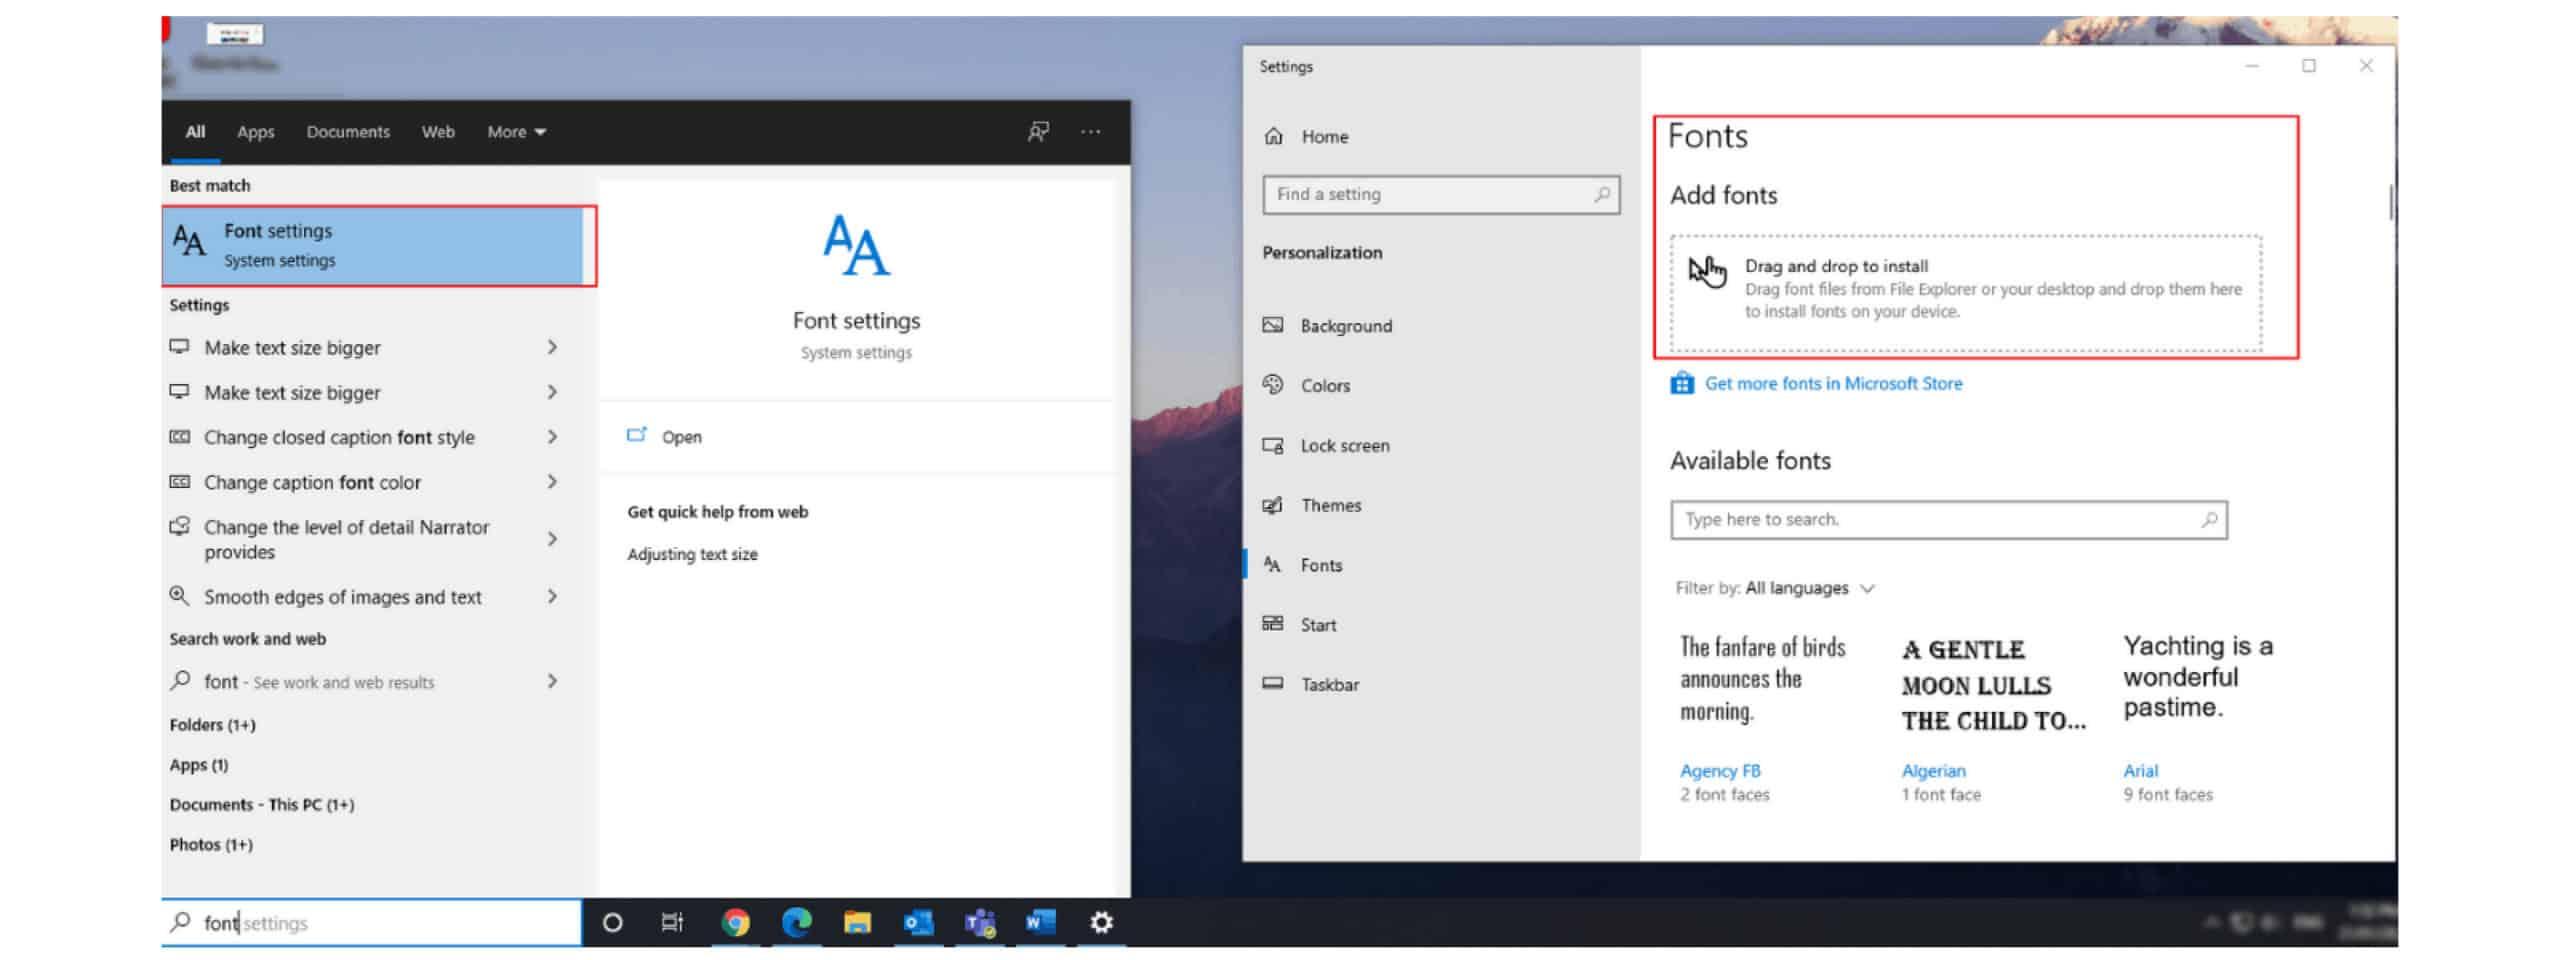 How do I transfer my fonts to a new computer? | Computing Australia